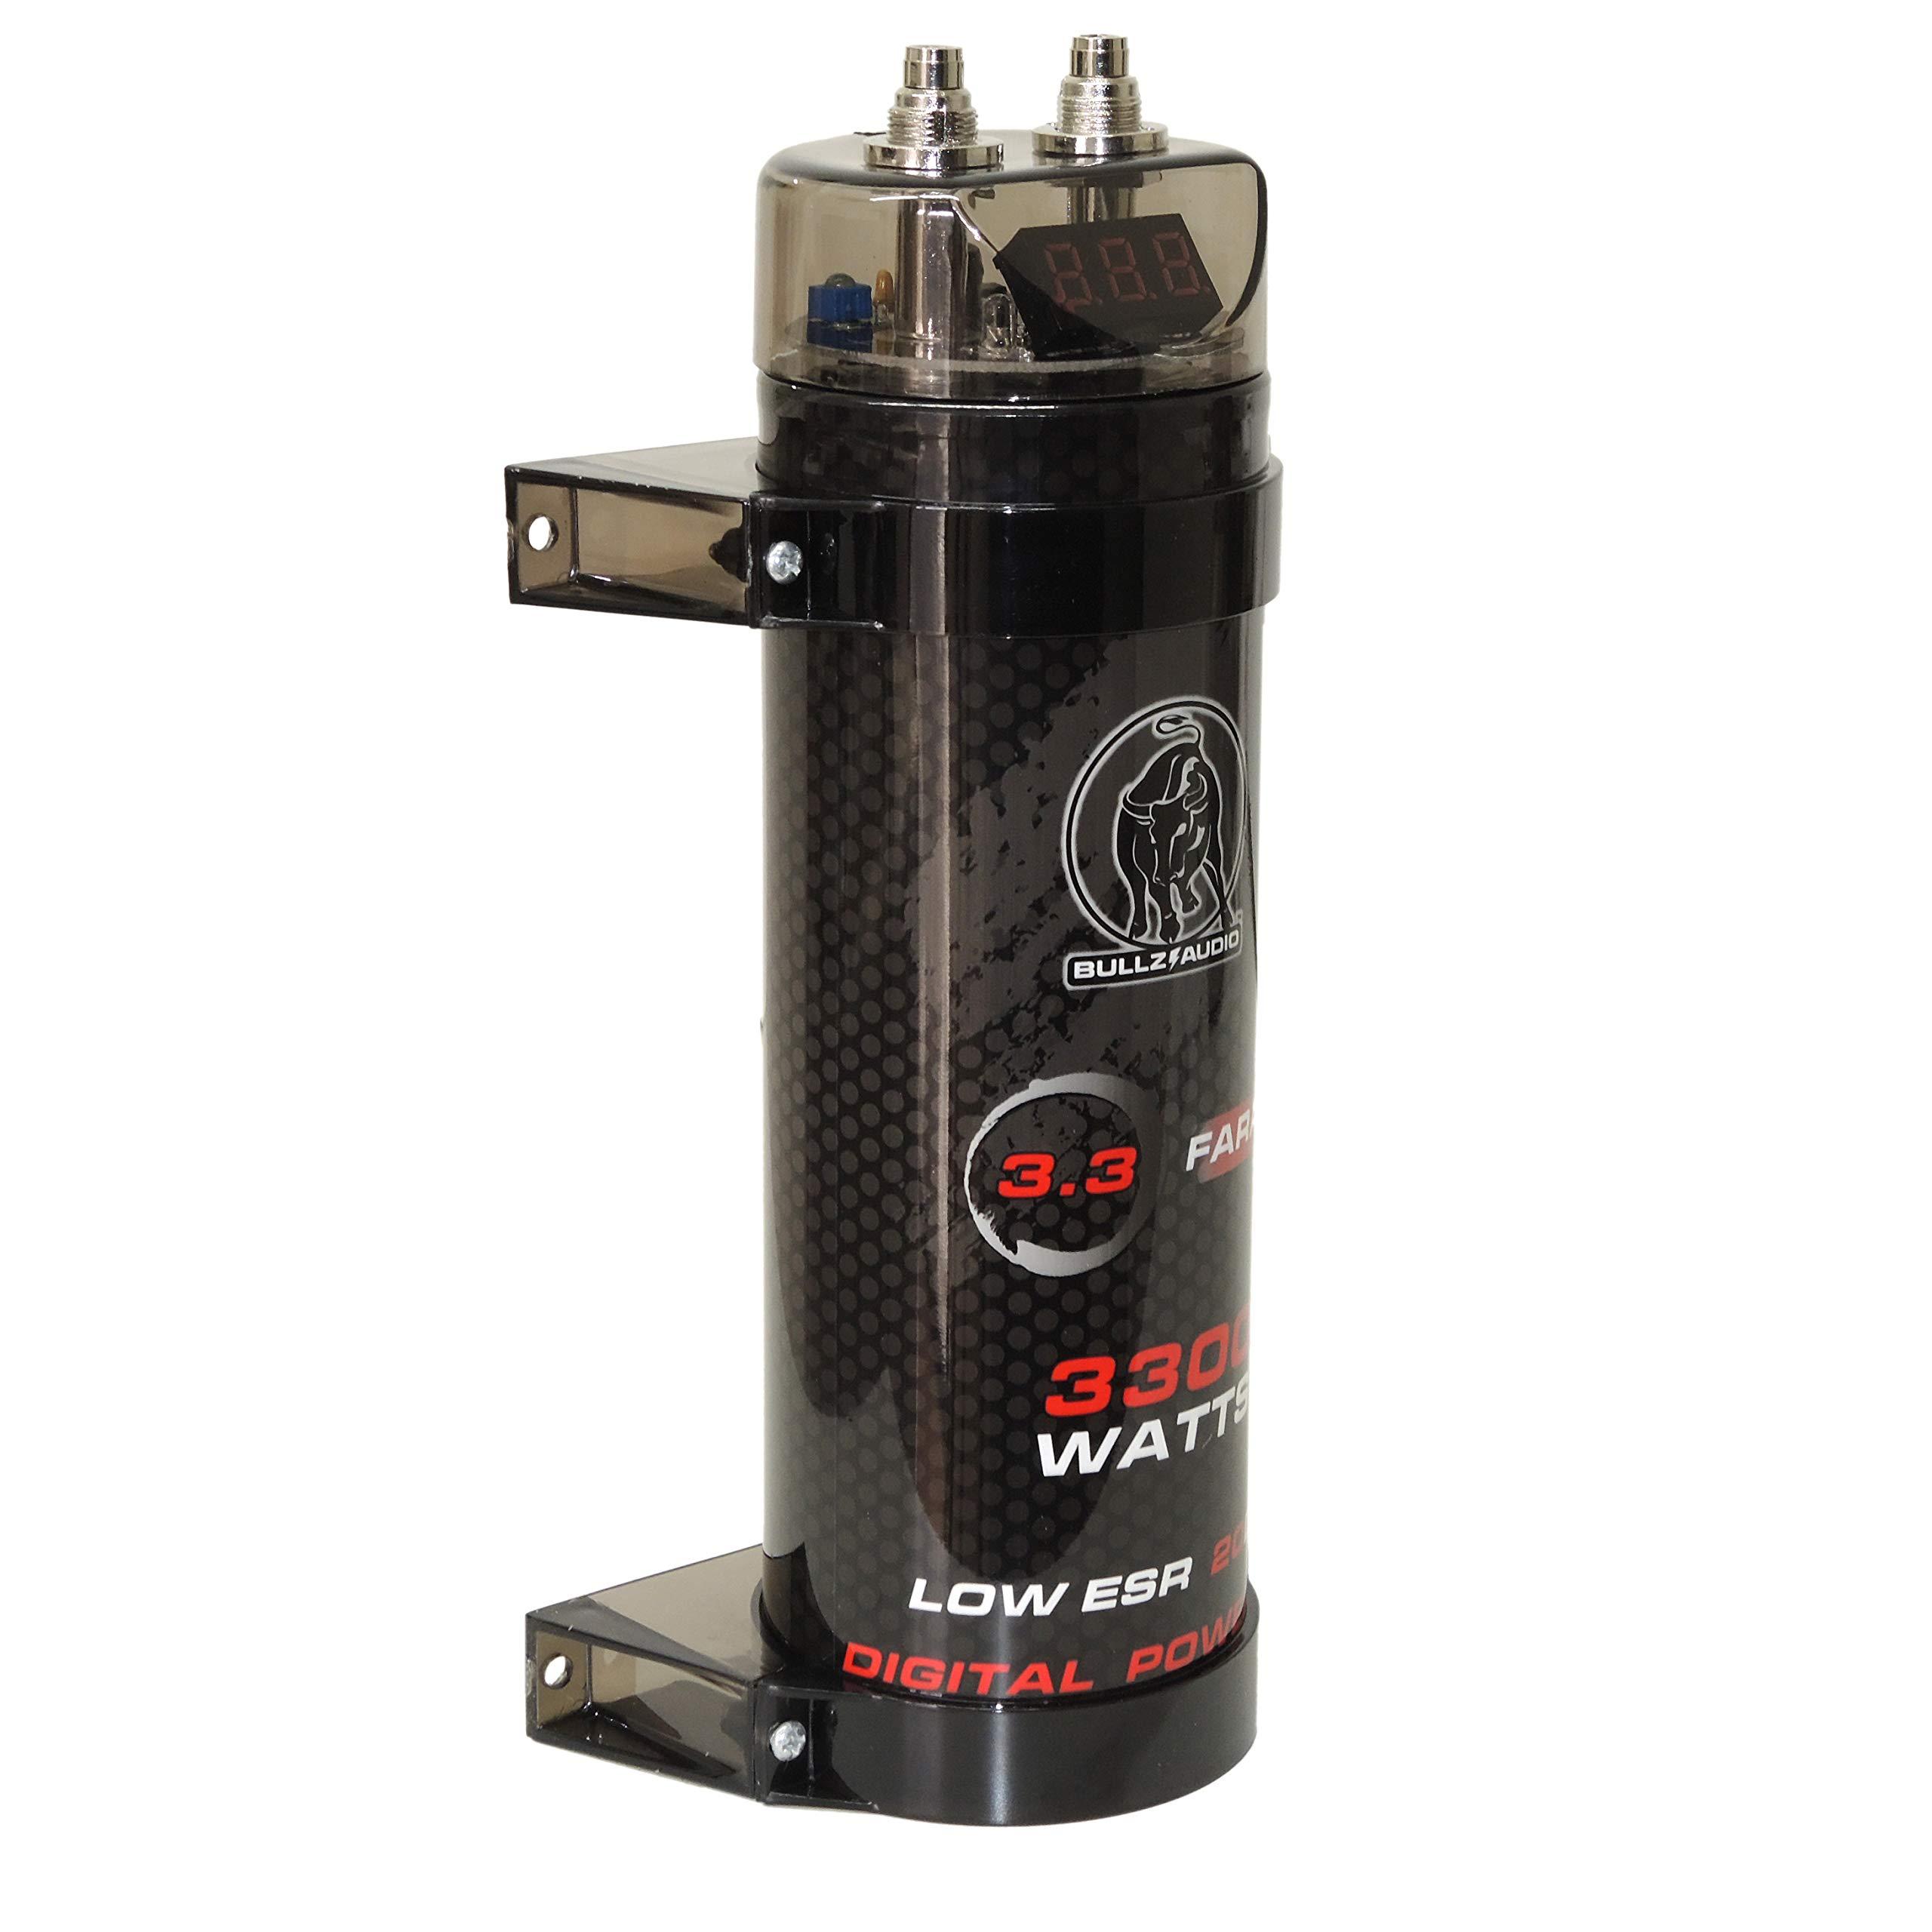 Bullz Audio 3300W 20VDC BCAP3.3 Car Digital Power 3.3 Farad Capacitor Cap